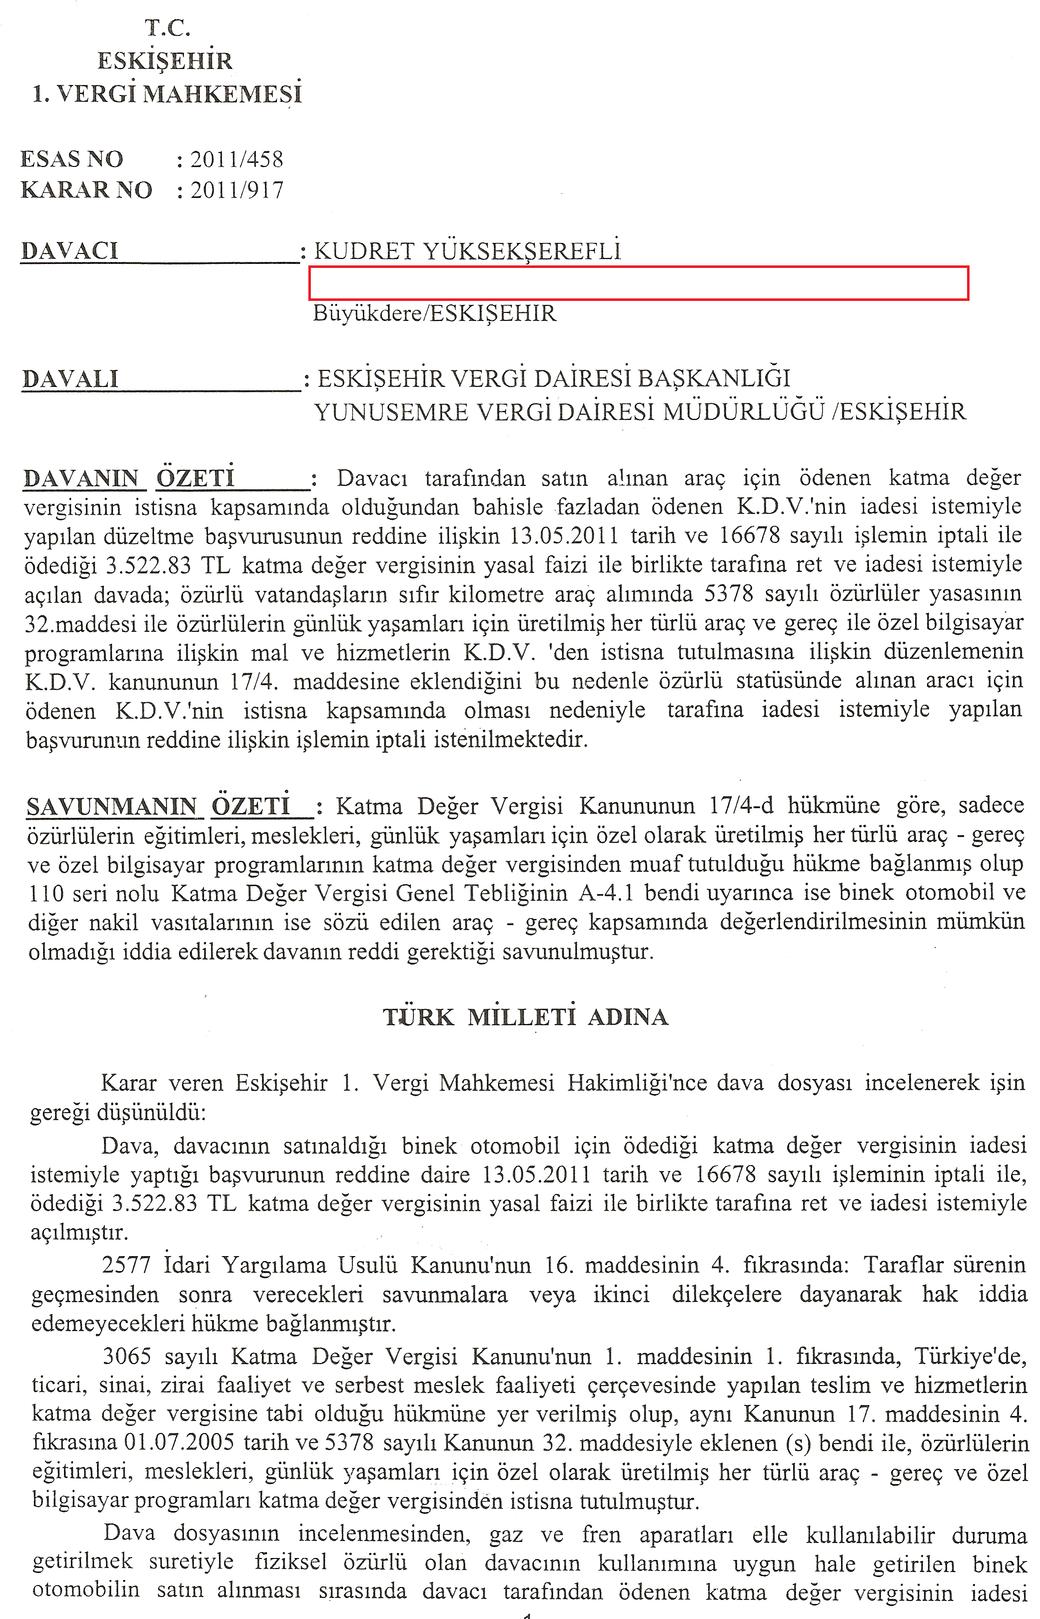 eskisehir vergi mahkemesi 1 - Sakat stat�s�nde al�nan ara� i�in �denen KDV'nin geri al�nmas� i�lemleri ve s�re�